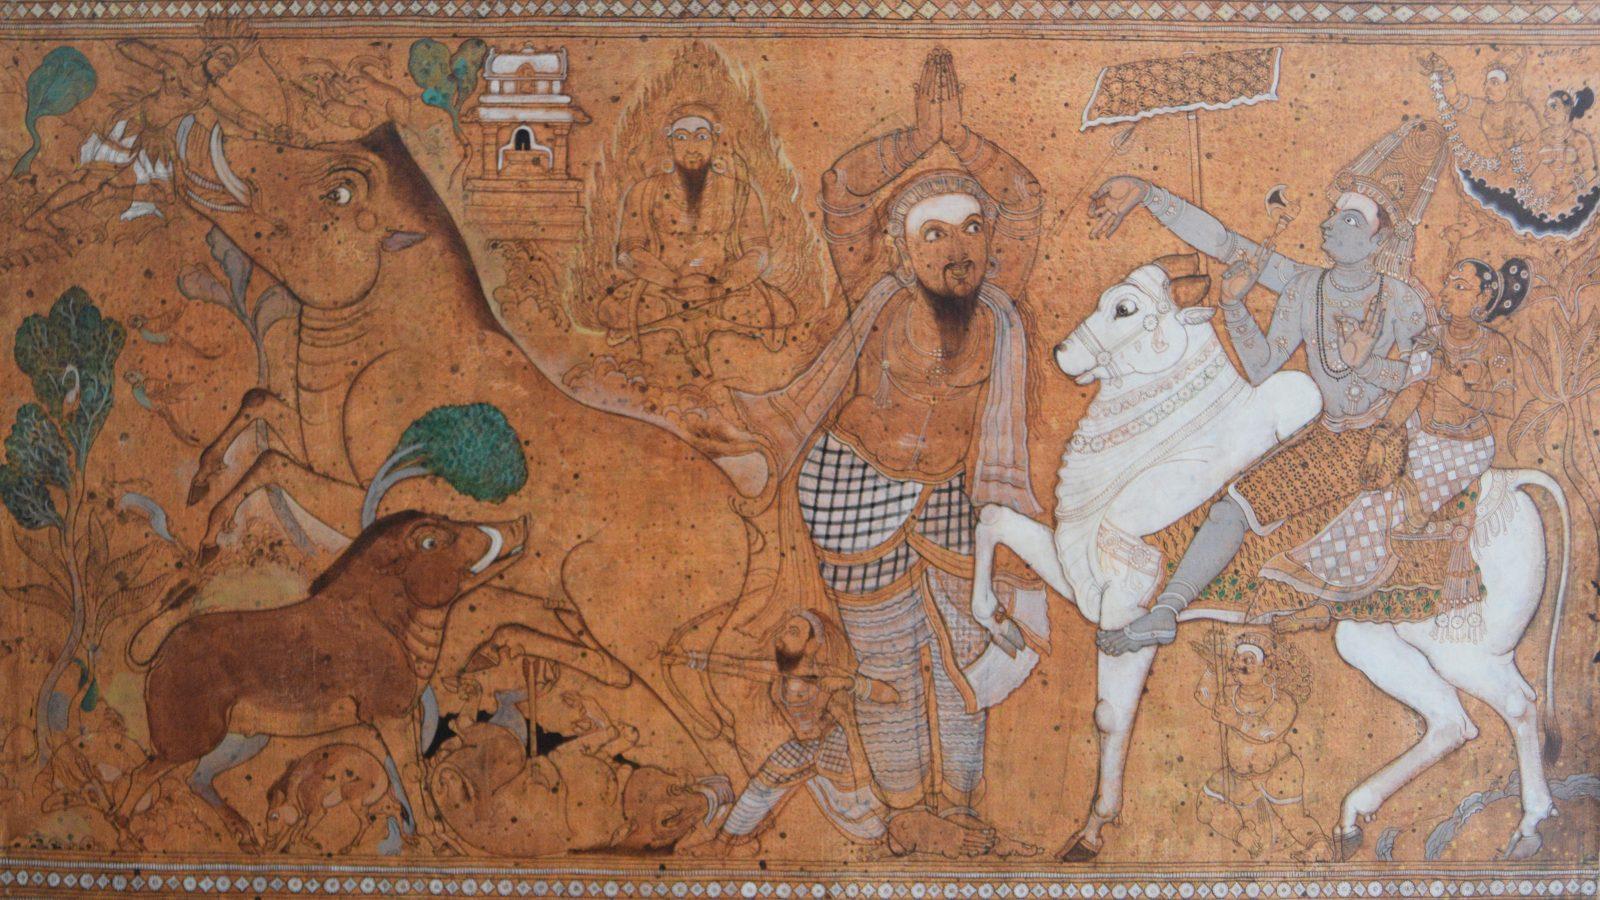 Giridhar Gowd. Kiratharjuneeyam, 2017. Courtesy of Kalakriti Art Gallery